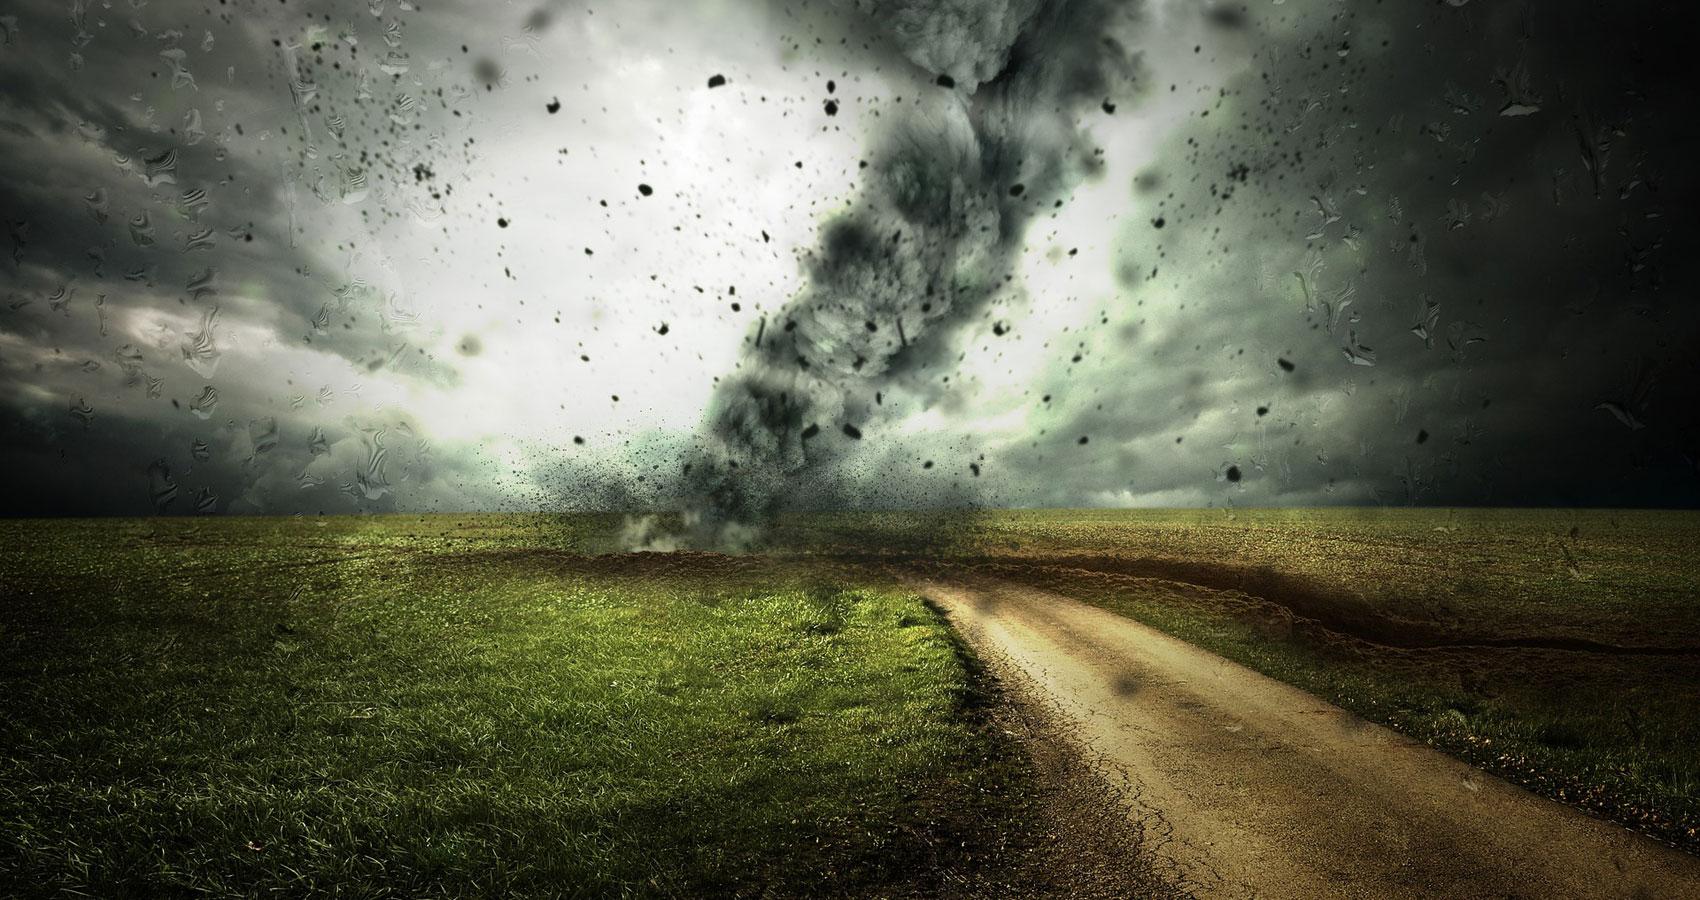 Hurricane, a poem written by Tori Stambaugh at Spillwords.com